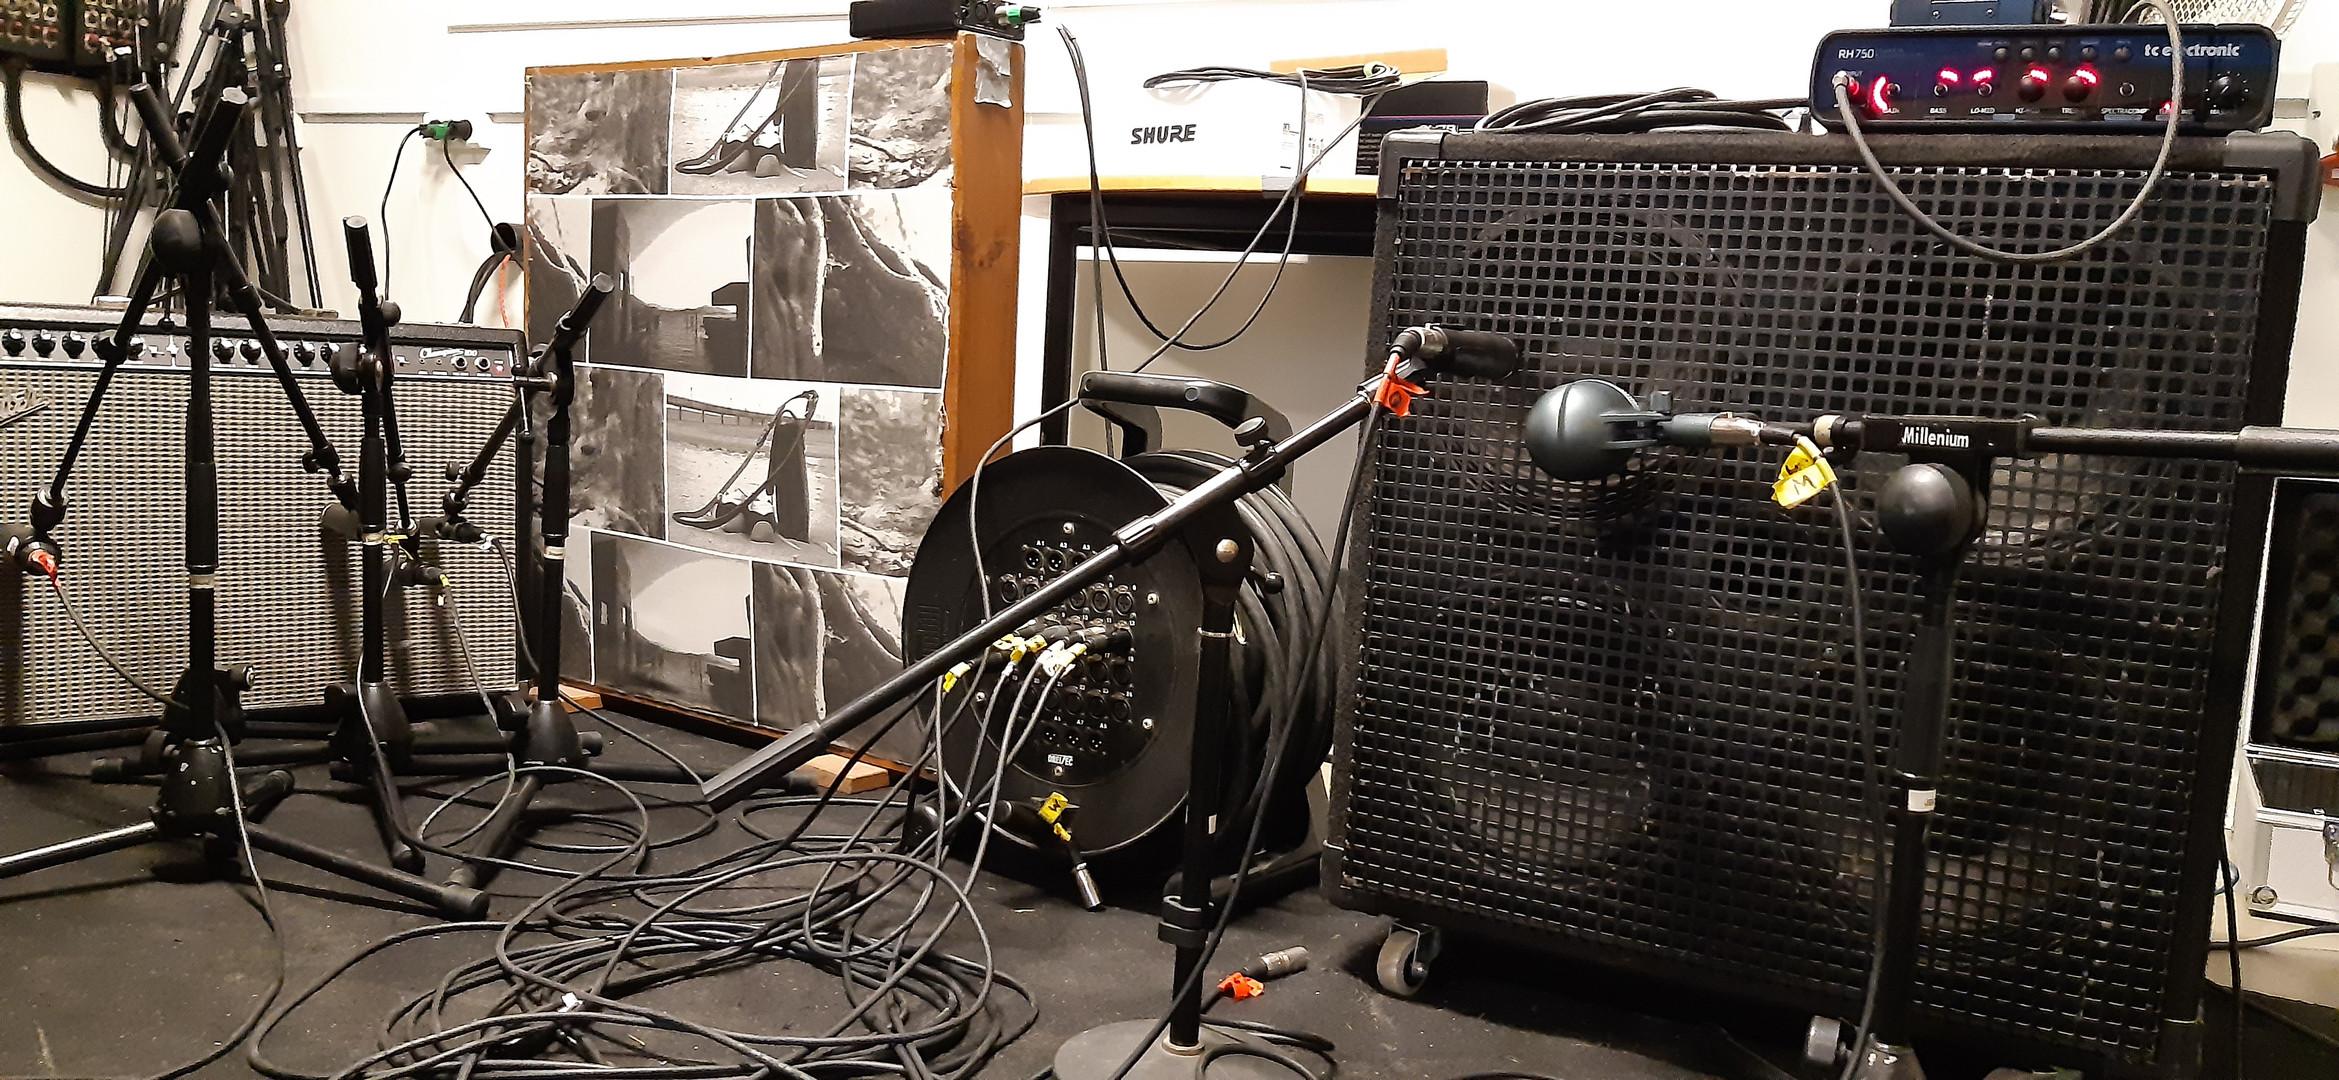 Recording bass and guitar